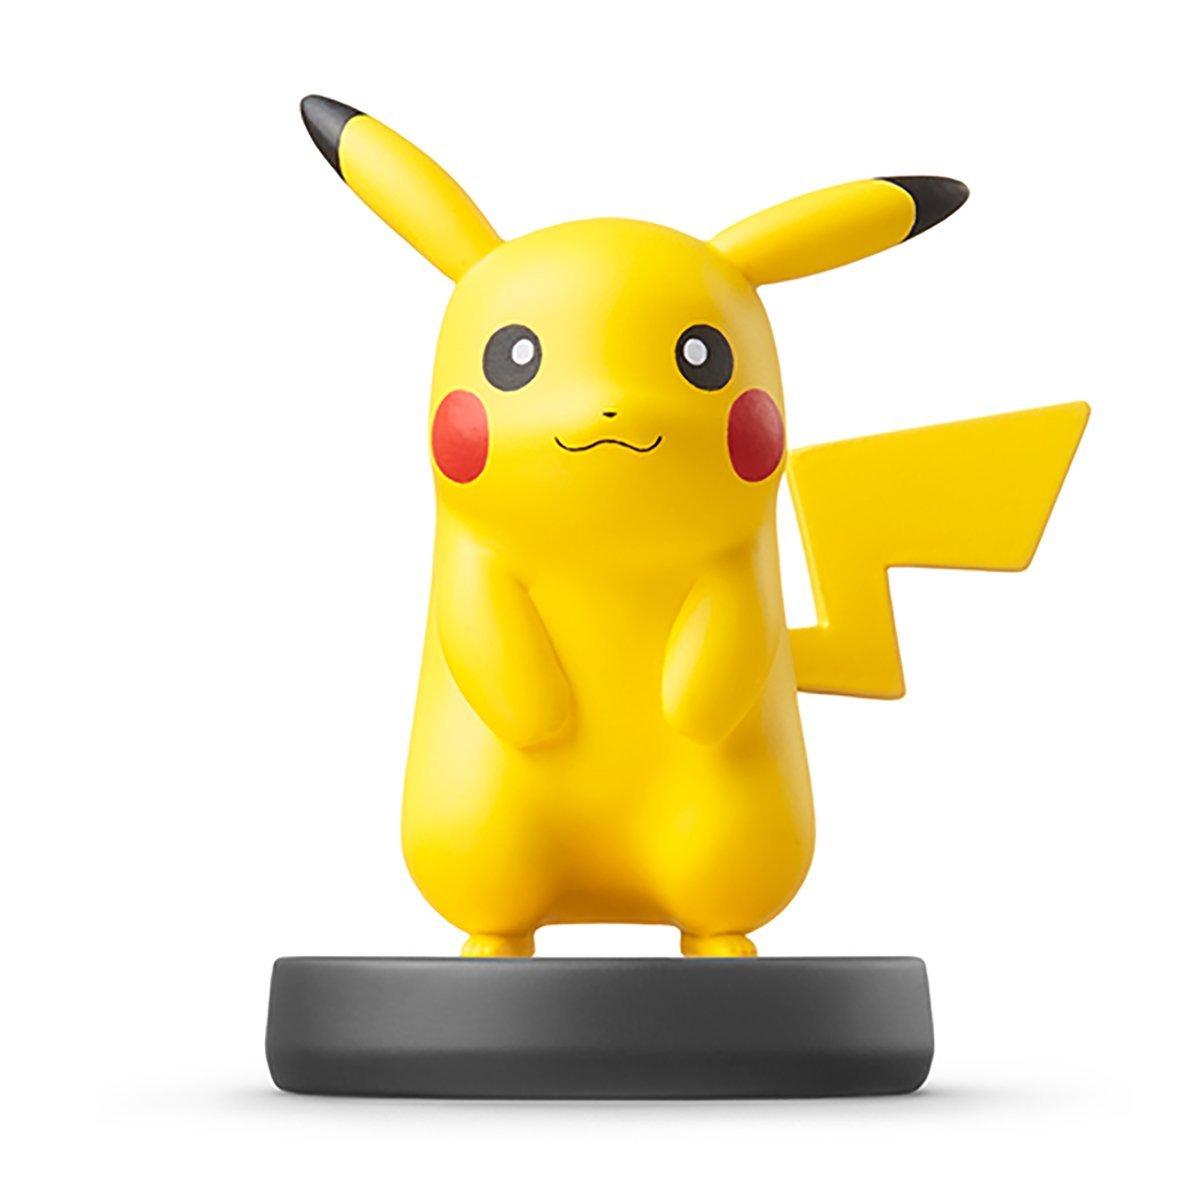 Amiibo 皮卡丘 公仔 pikachu 互動 Wii U/New3DS/New3DS LL 公仔